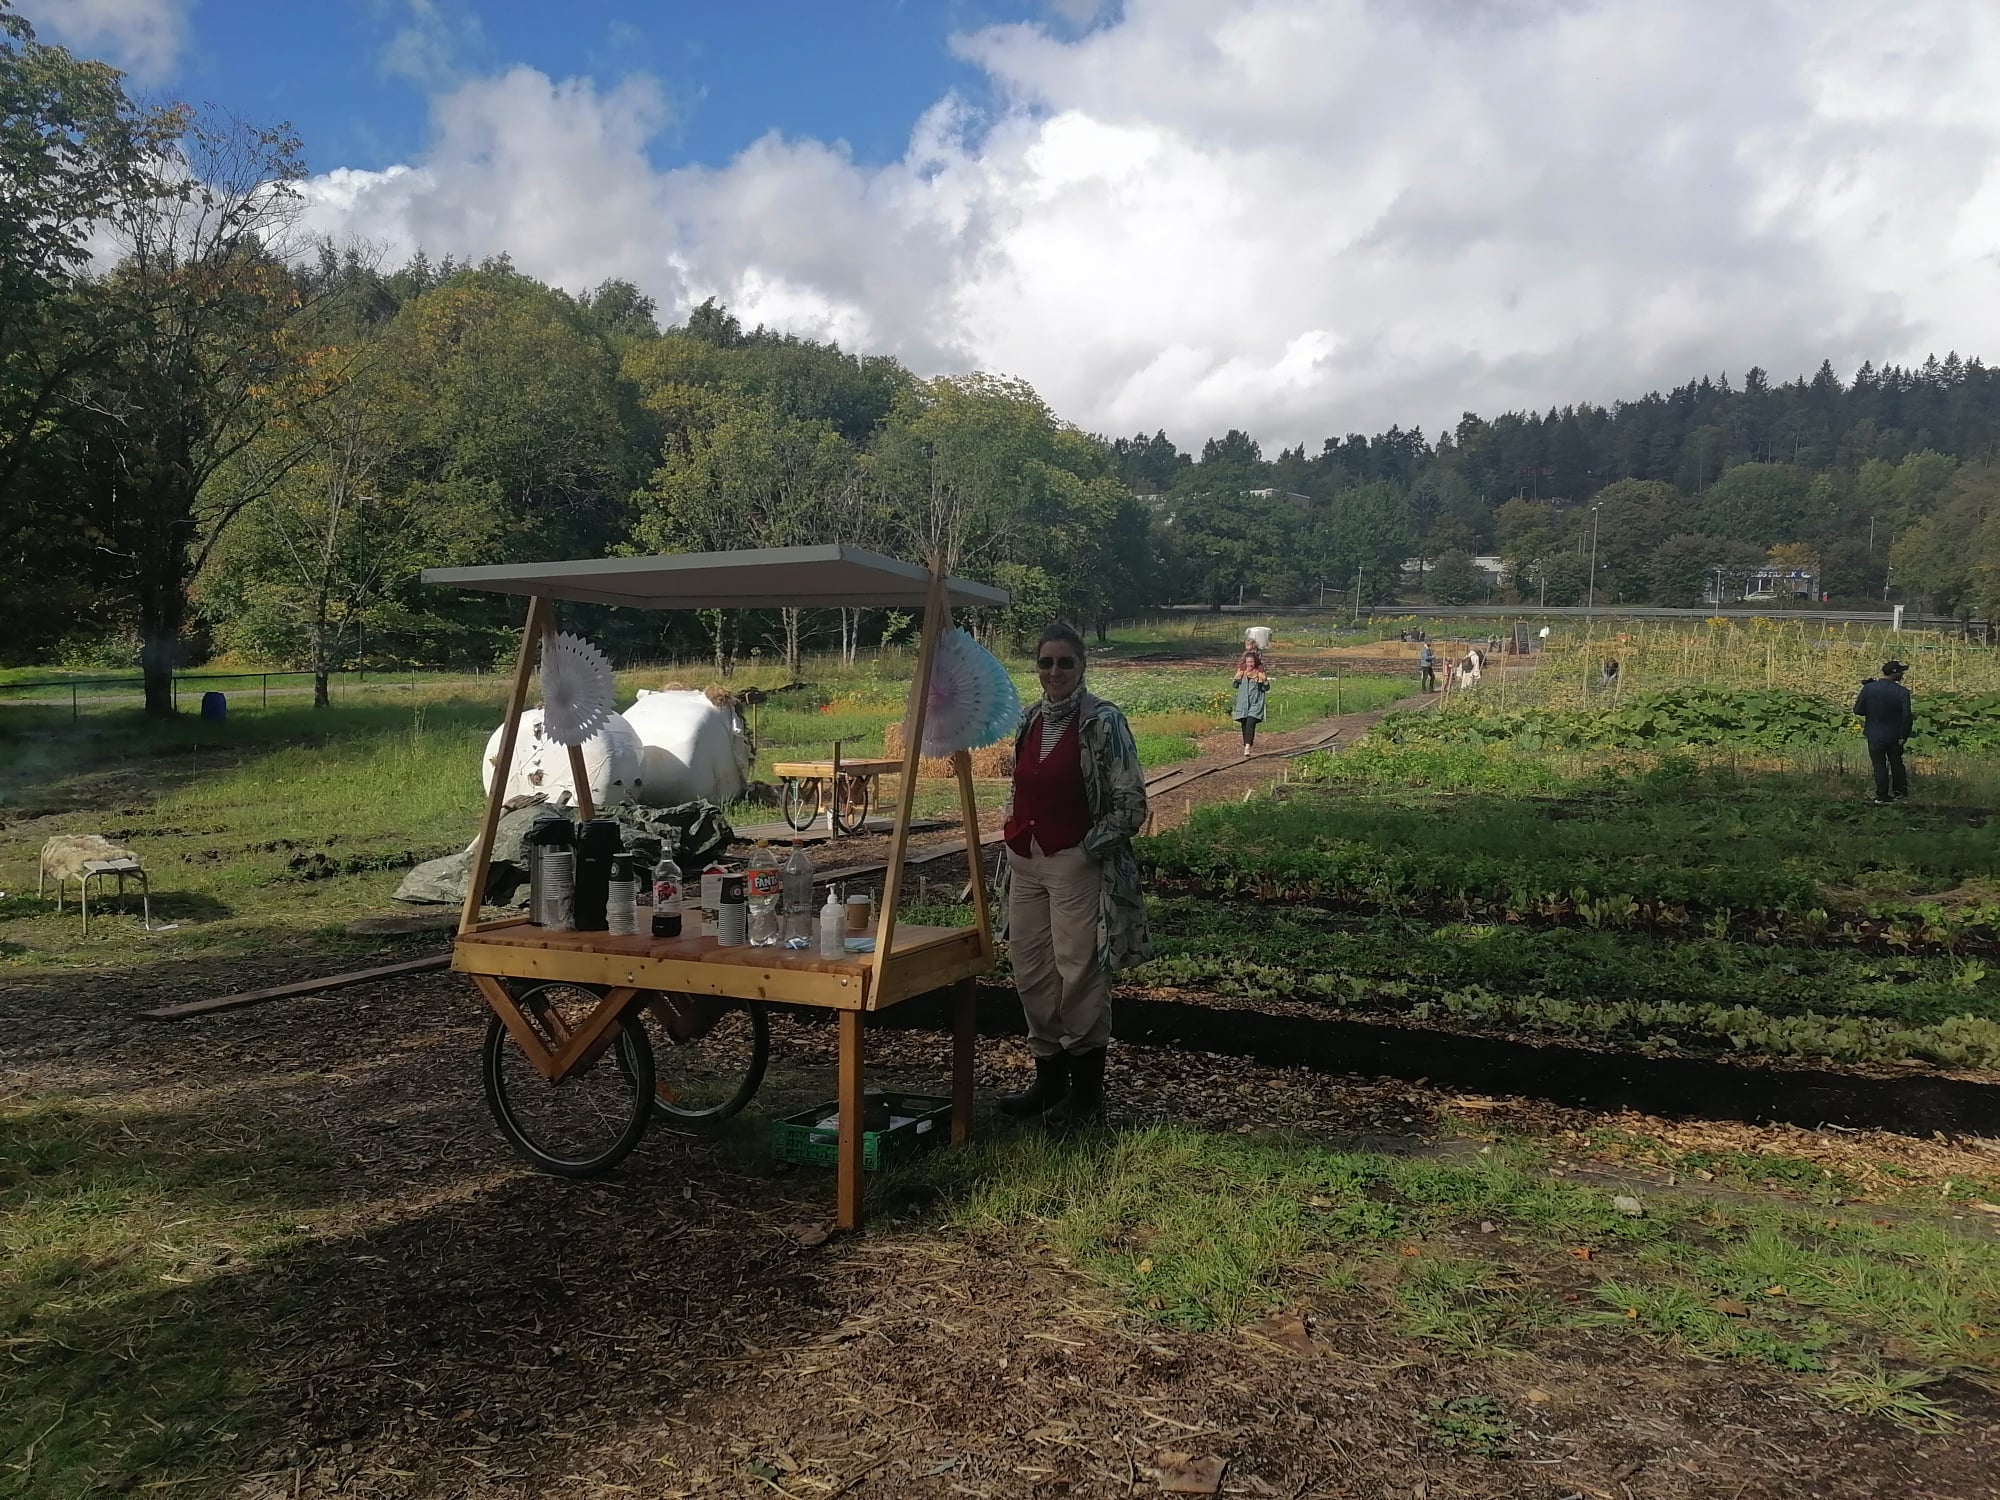 Image 4. Mobile wagon at Linderud farm. Source: Kimberly Weger.